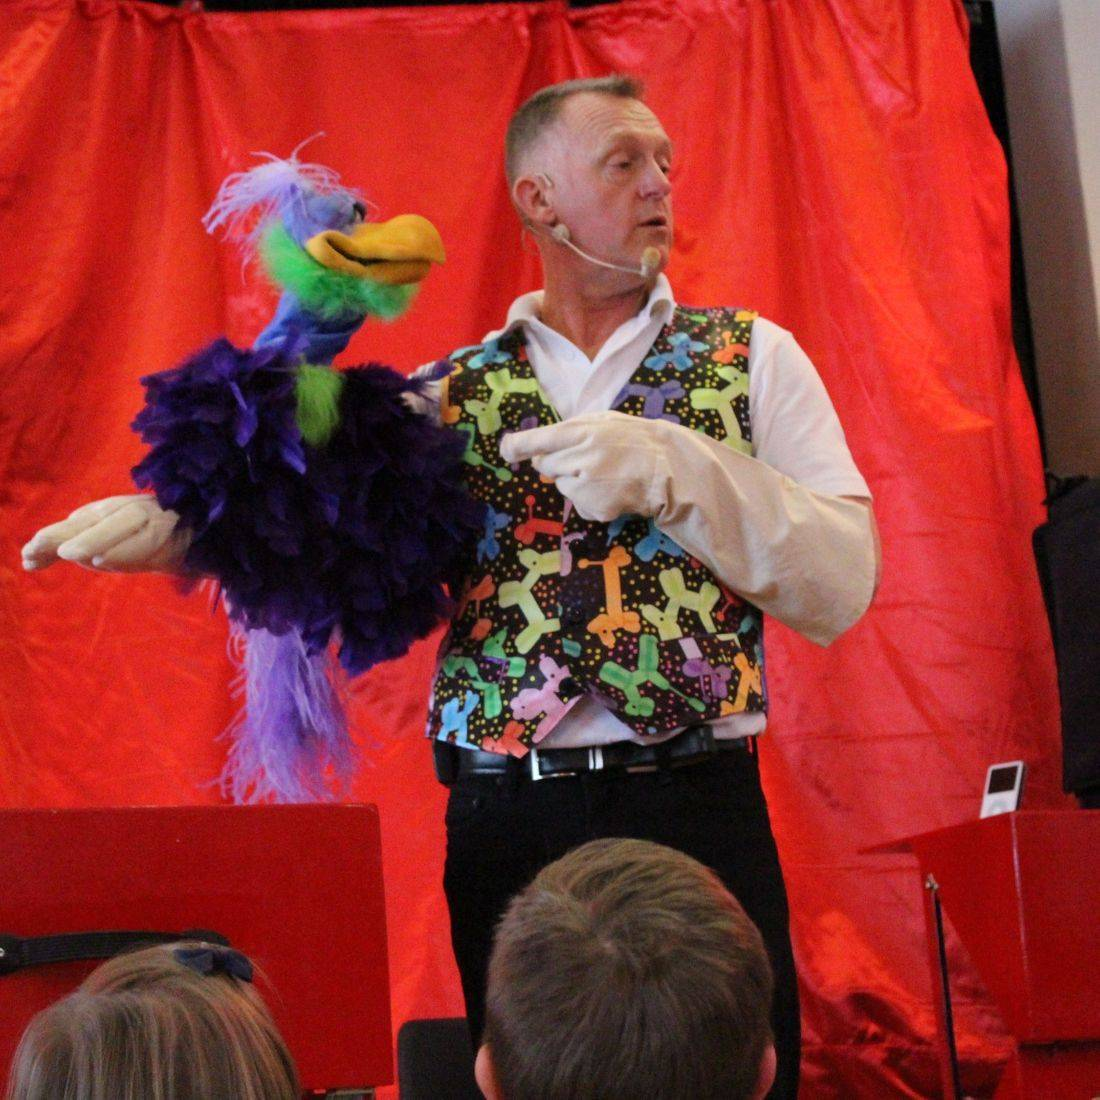 Dizzy Dean and Vern the bird puppet show